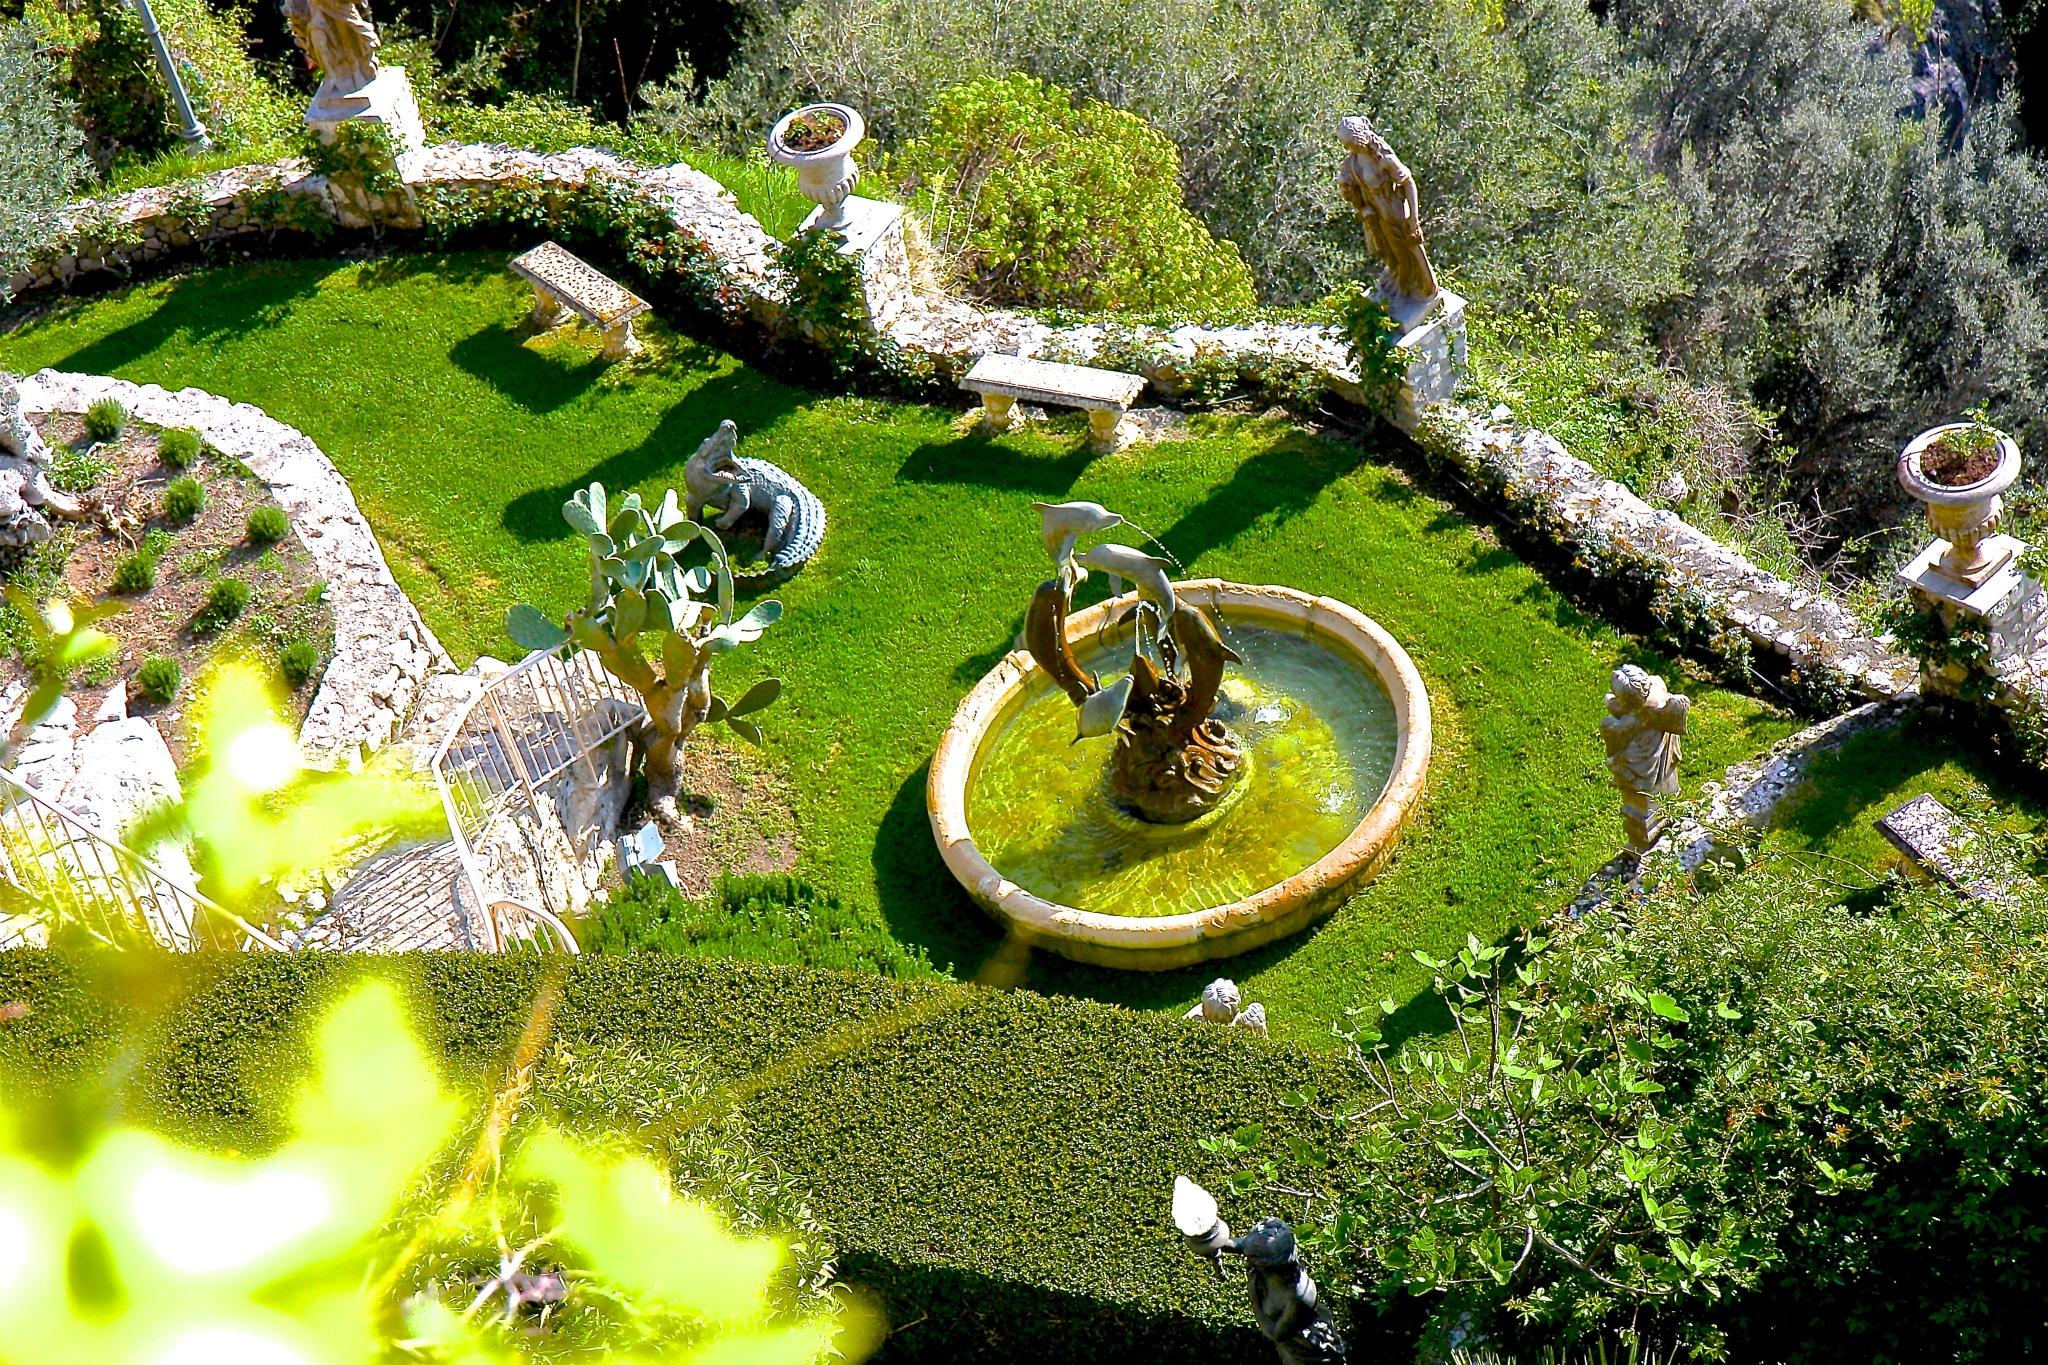 The hanging garden by Steven Thomas Densley